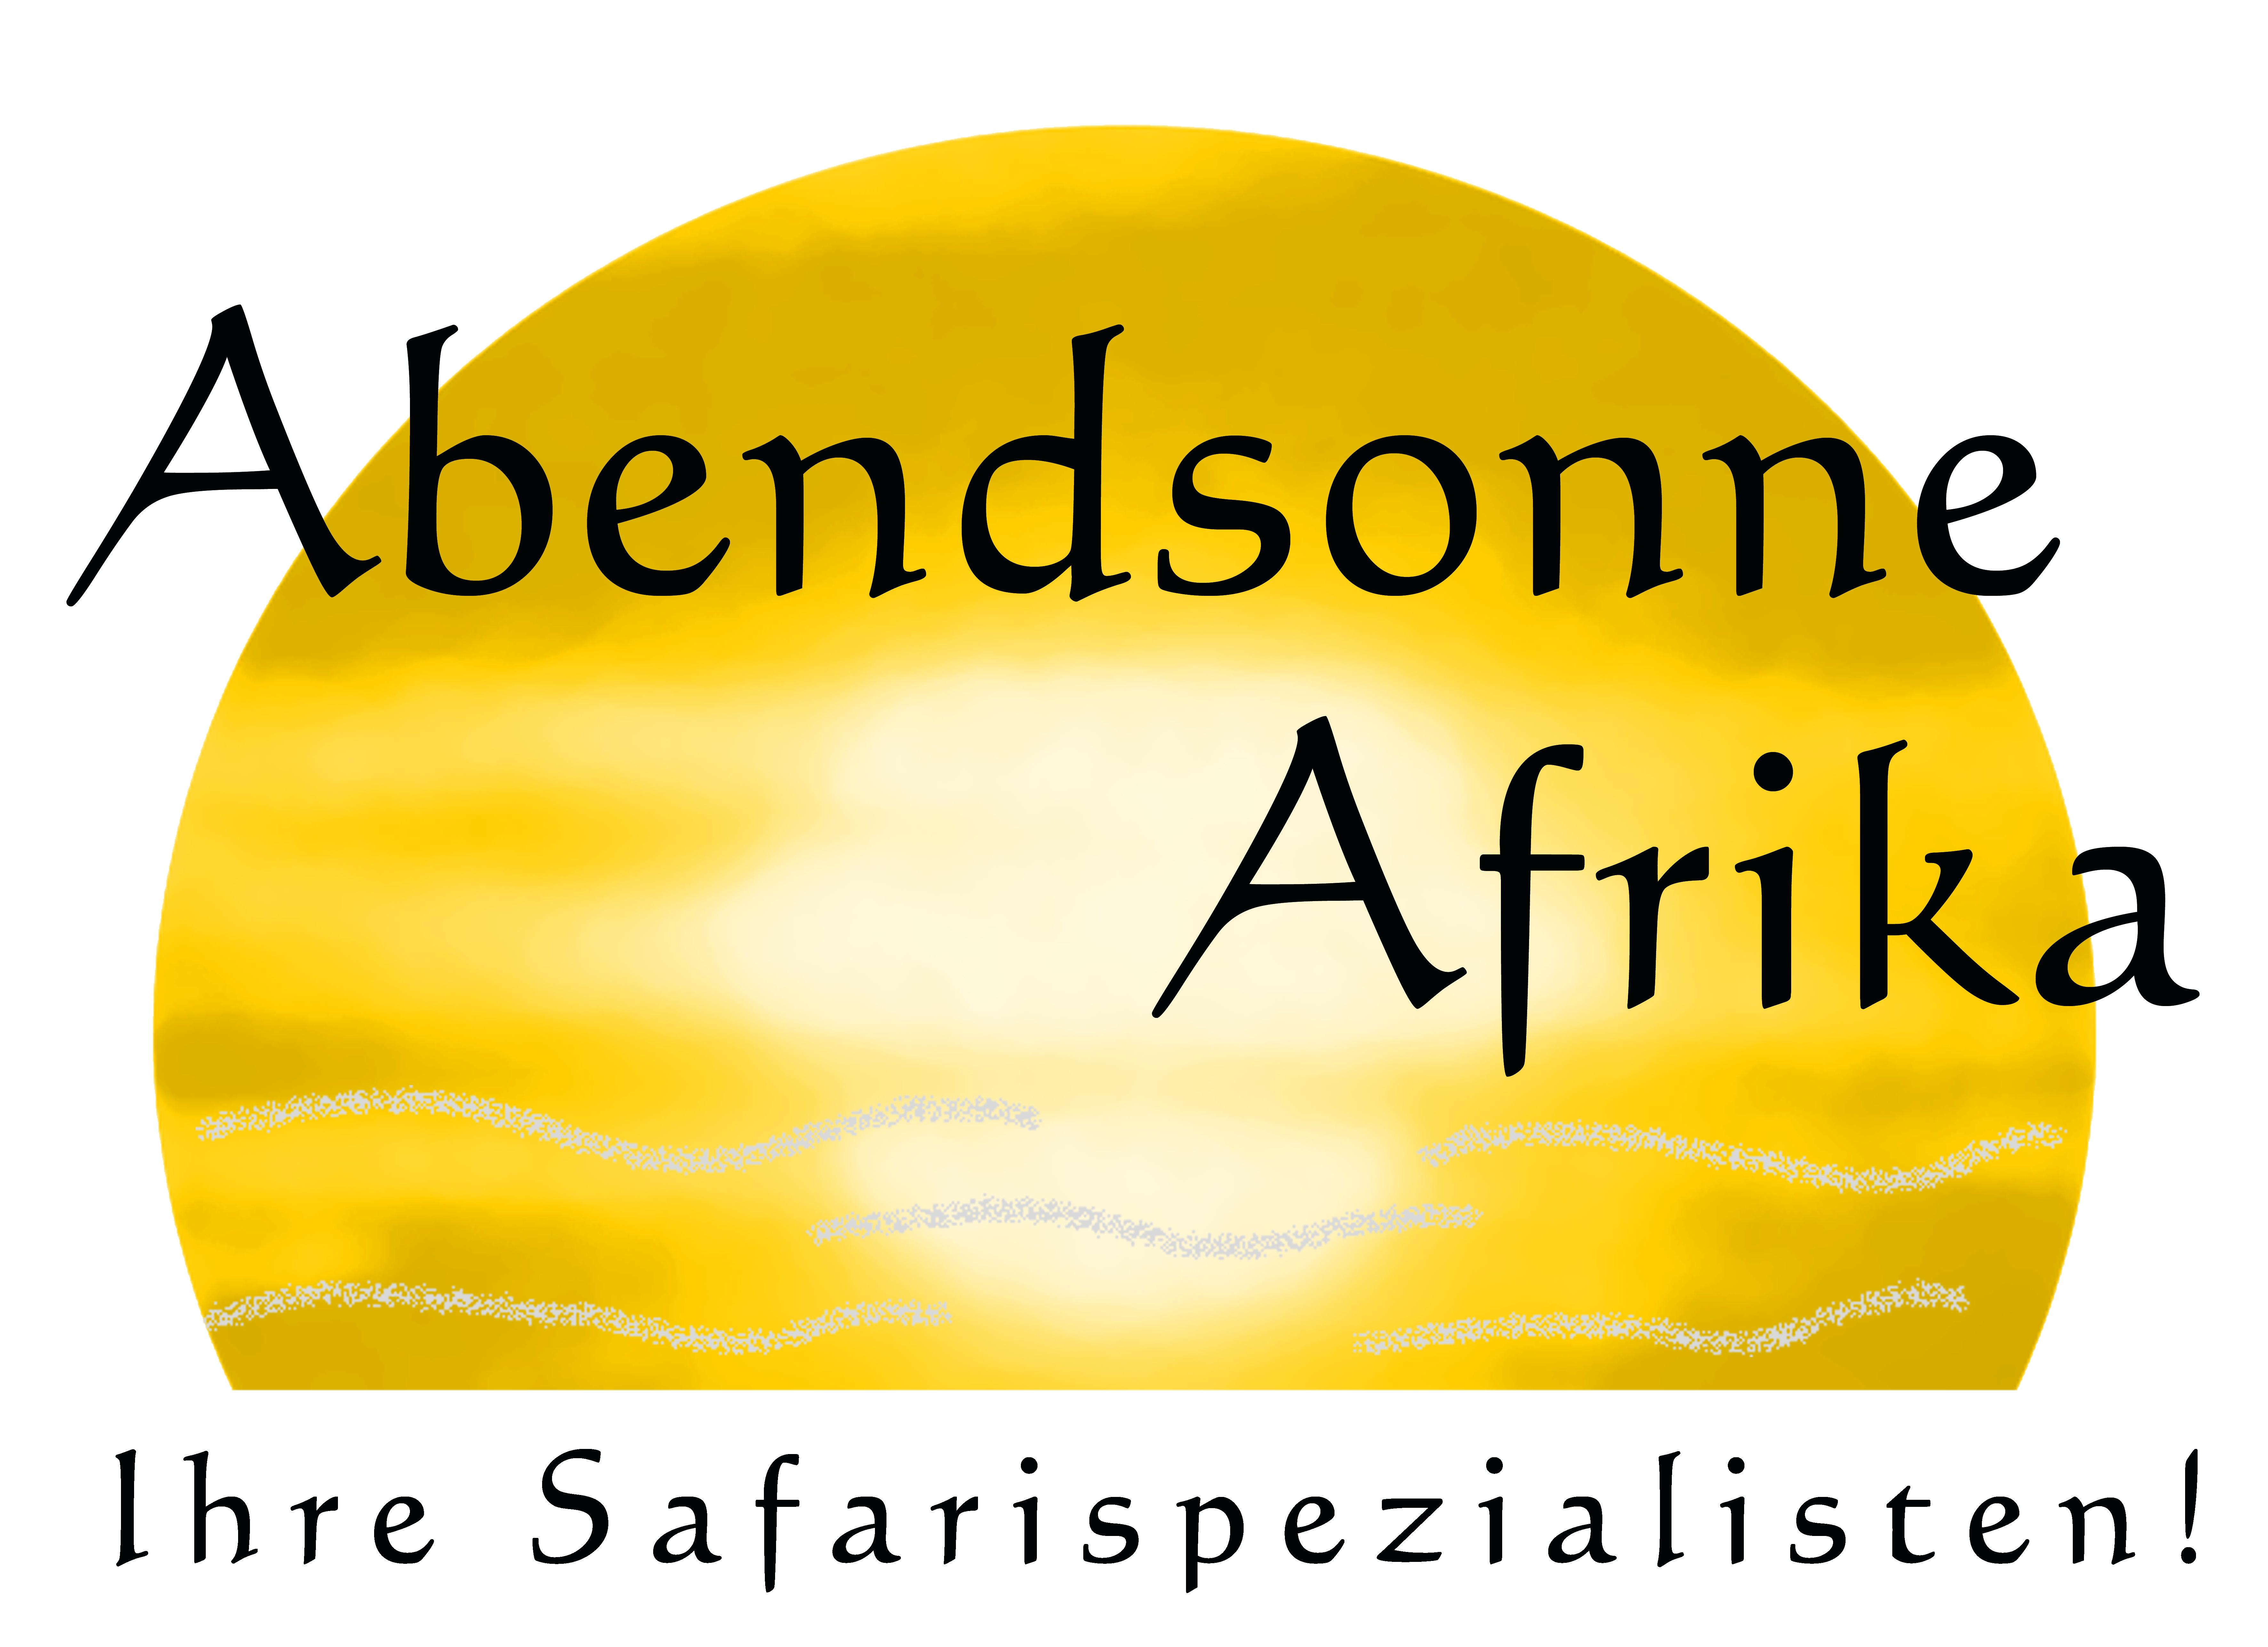 Abendsonne Afrika